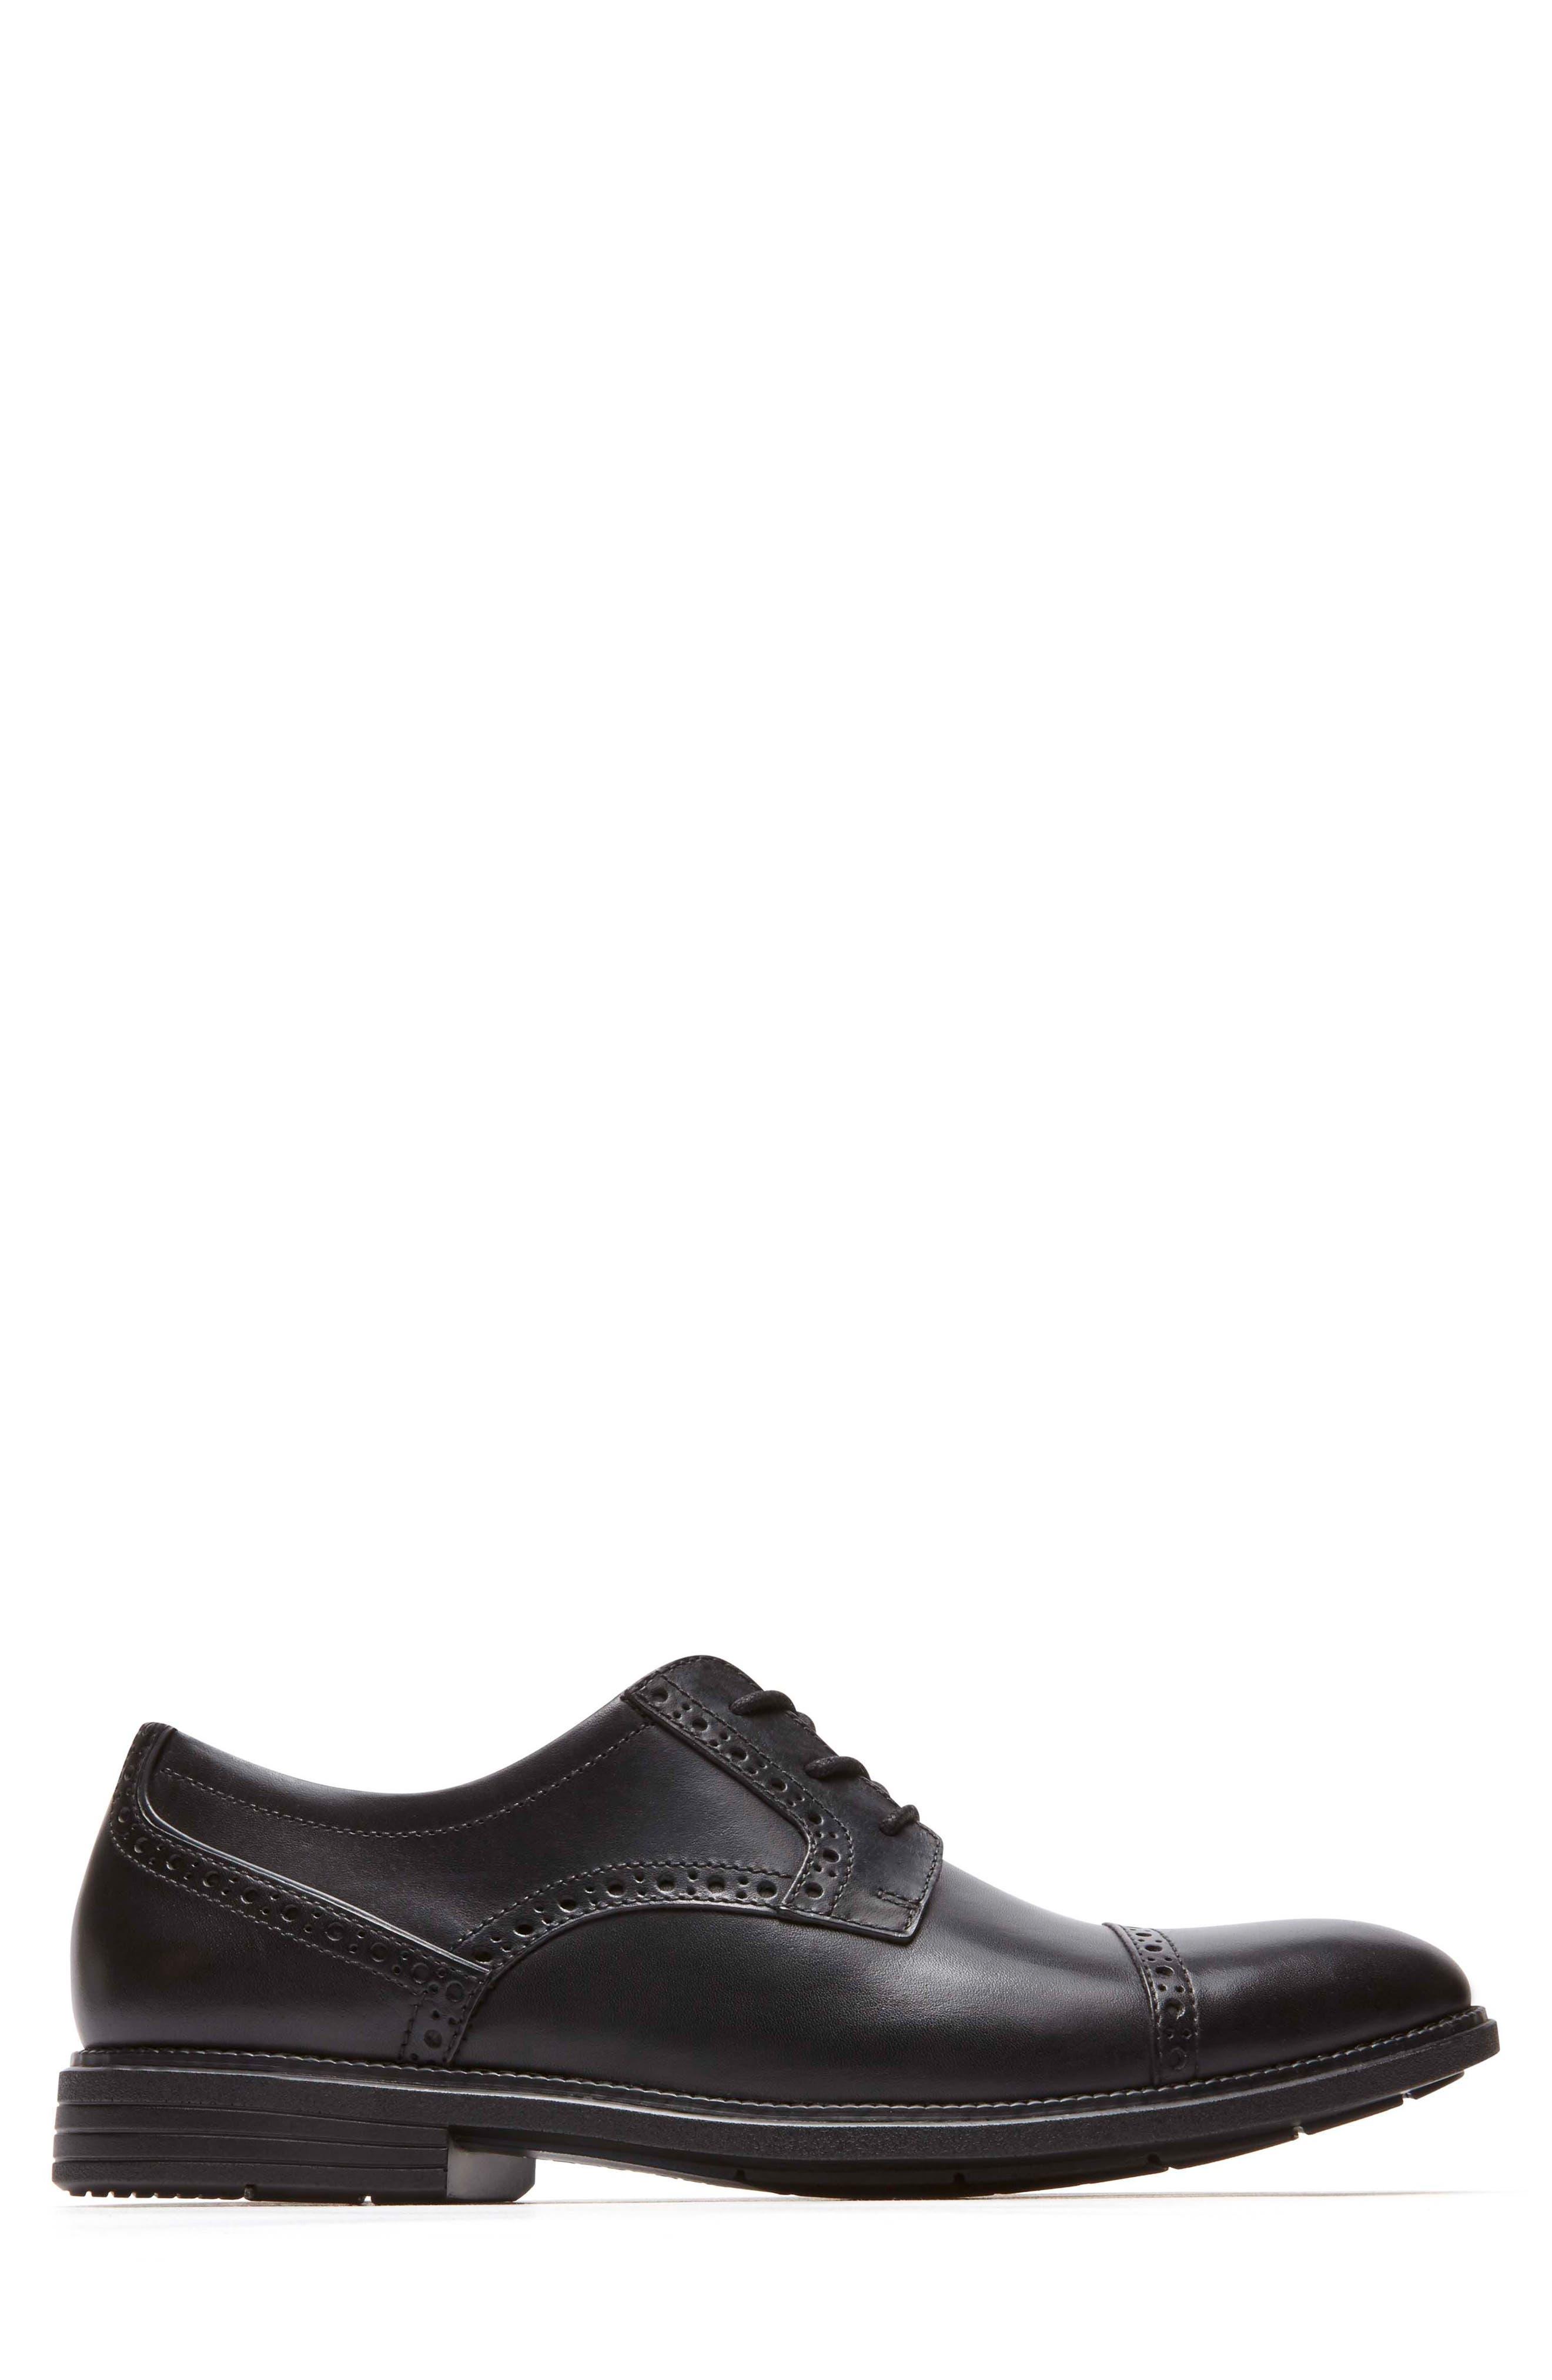 Madson Cap Toe Derby,                             Alternate thumbnail 3, color,                             Black Leather